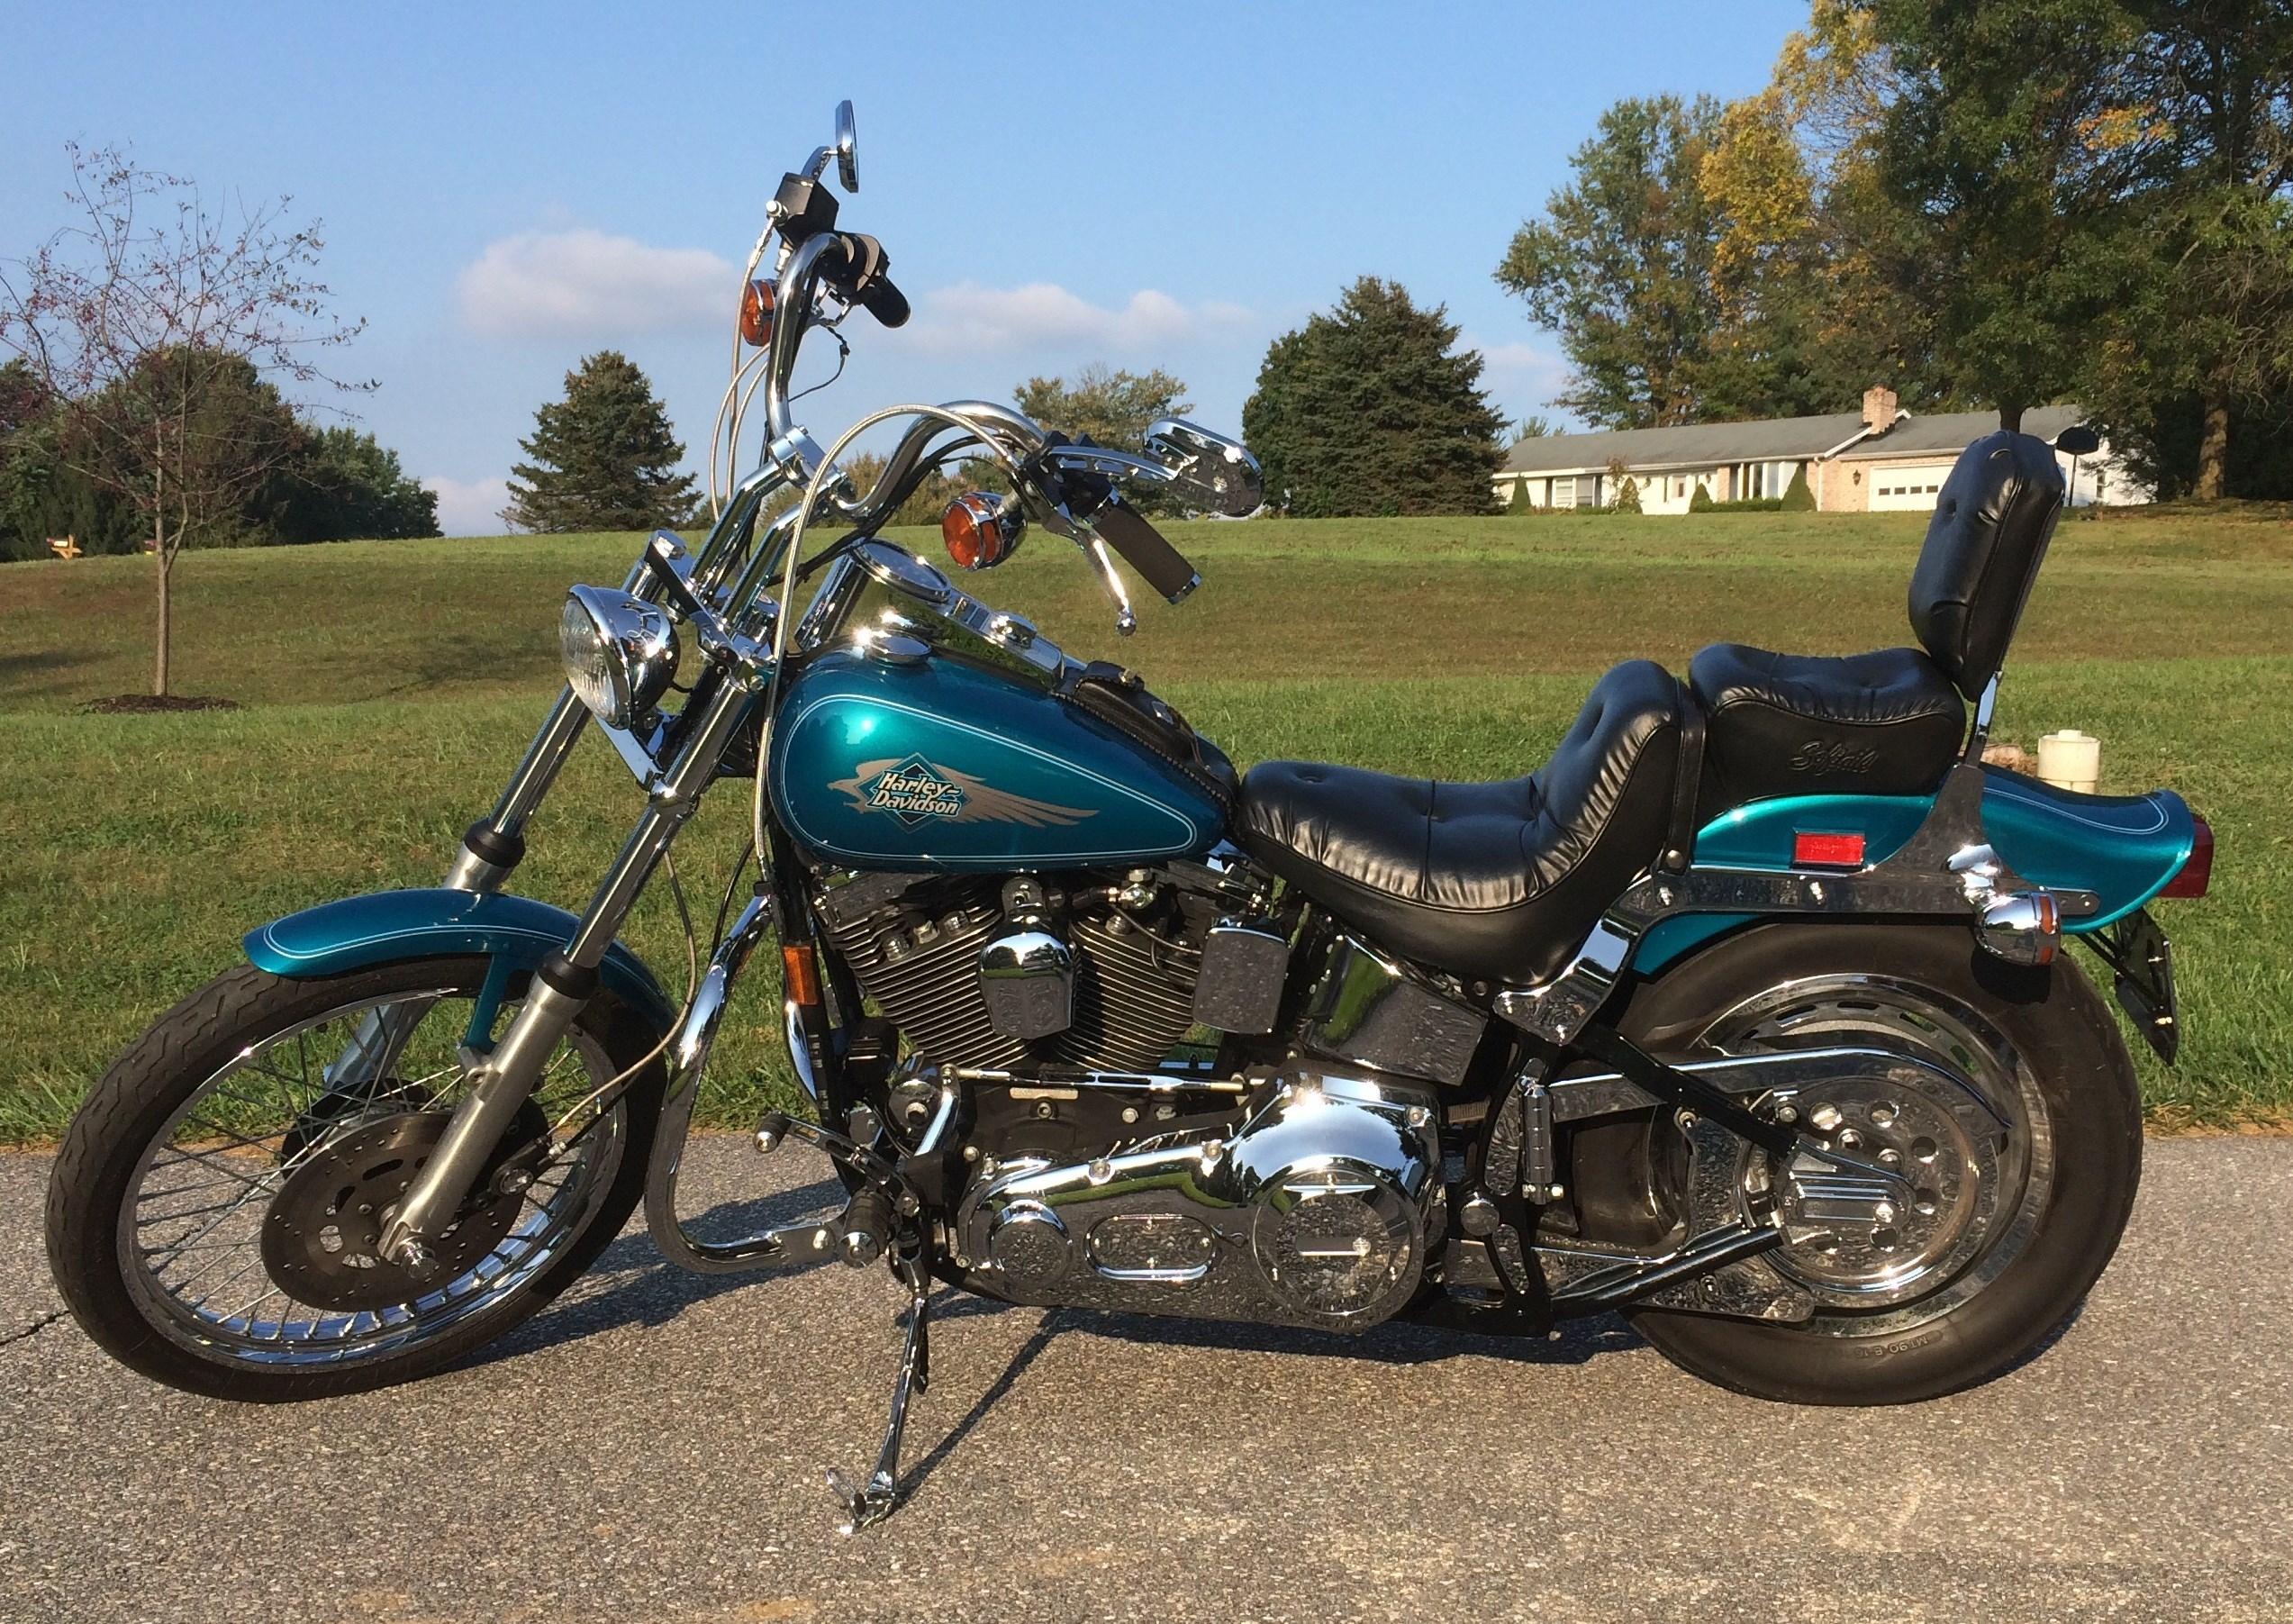 1995 Harley-Davidson® FXSTC Softail® Custom (Teal/Blue), Westminster